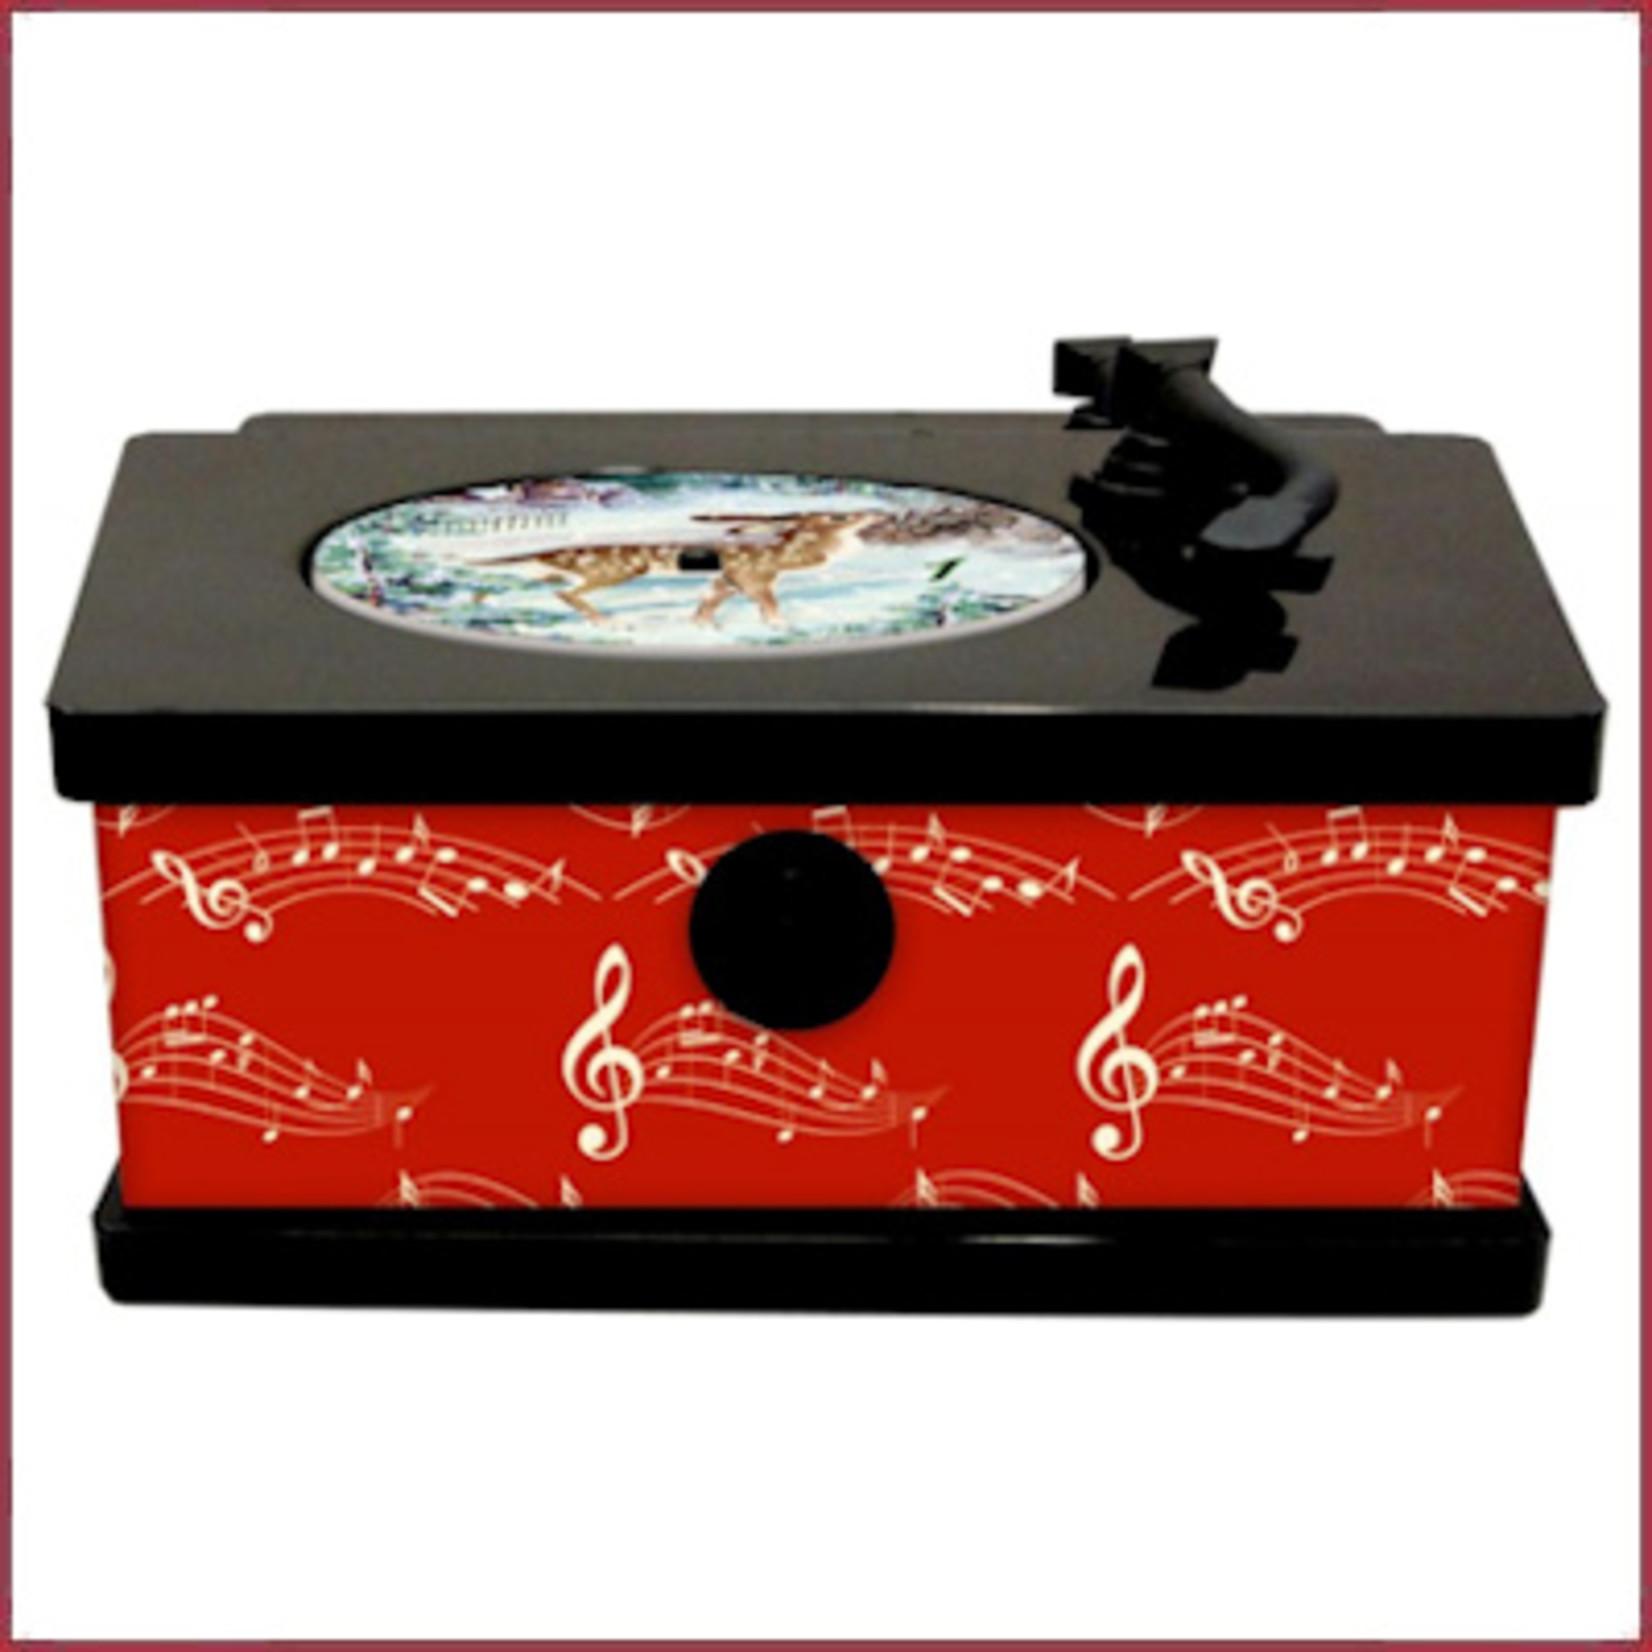 Spiegelburg Vintage Platenspeler / muziekdoosje met adventsliedjes